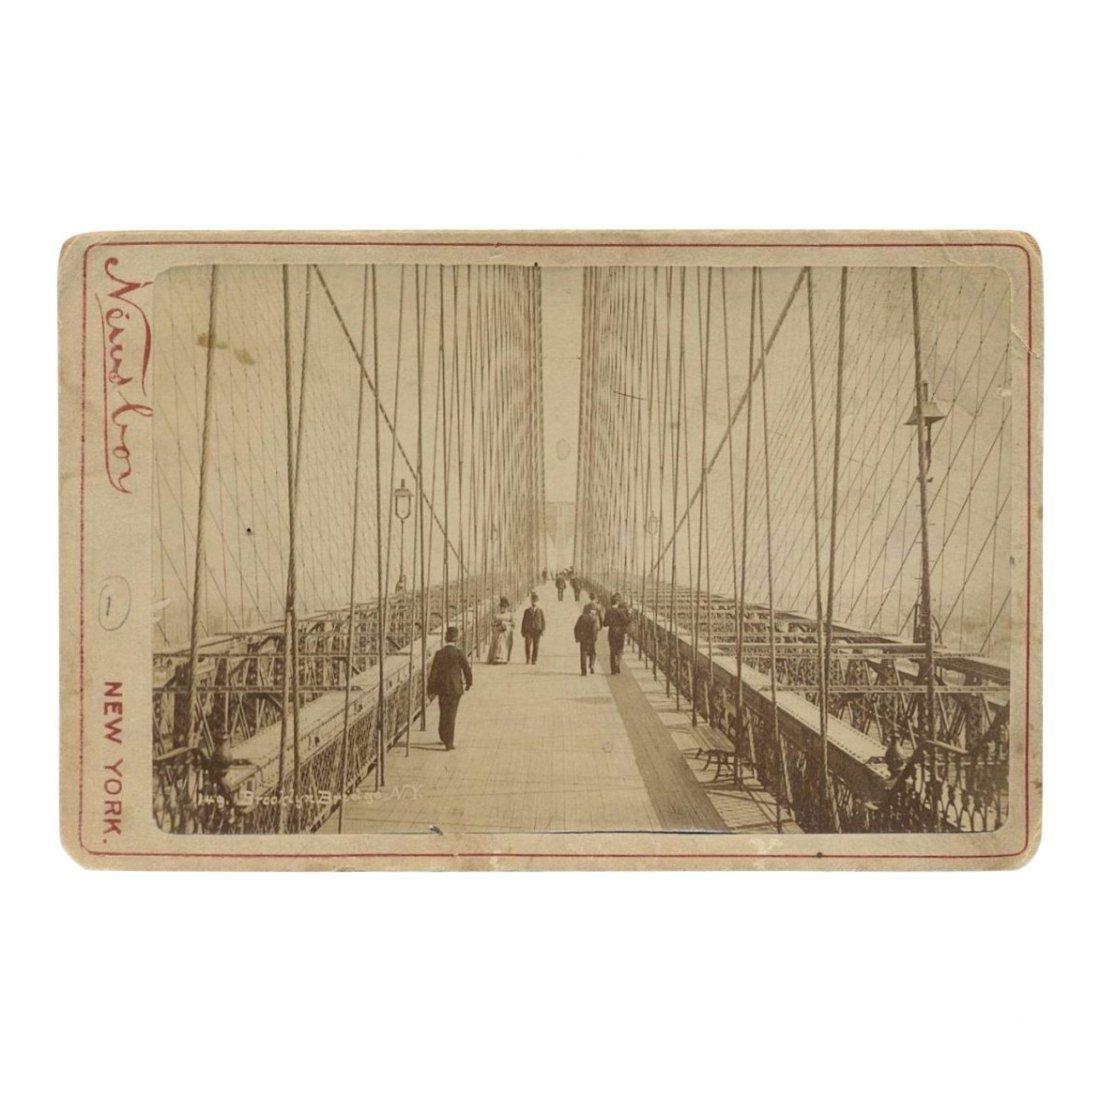 Brooklyn Bridge Pedestrians Card Photograph, 1880